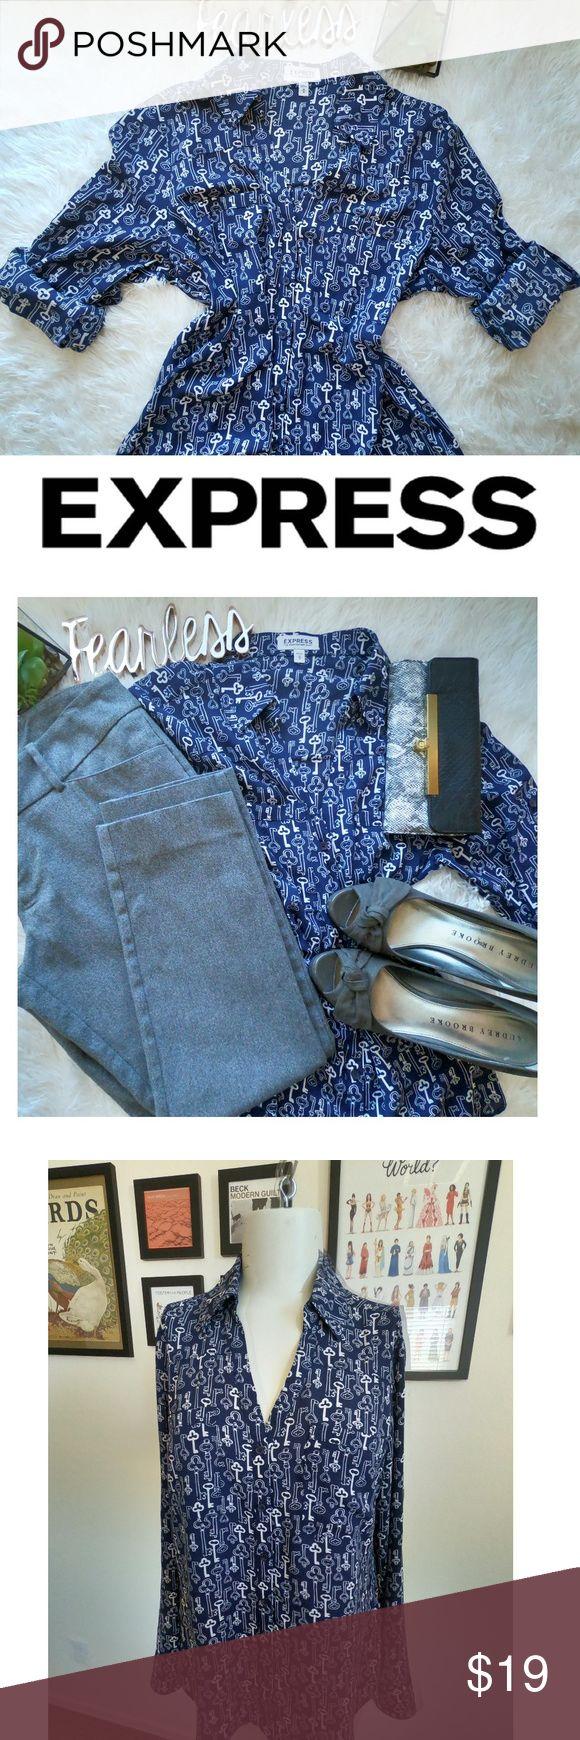 Portofino Key Print Convertible Sleeve Blouse M Express Portofino shirt, blouse….